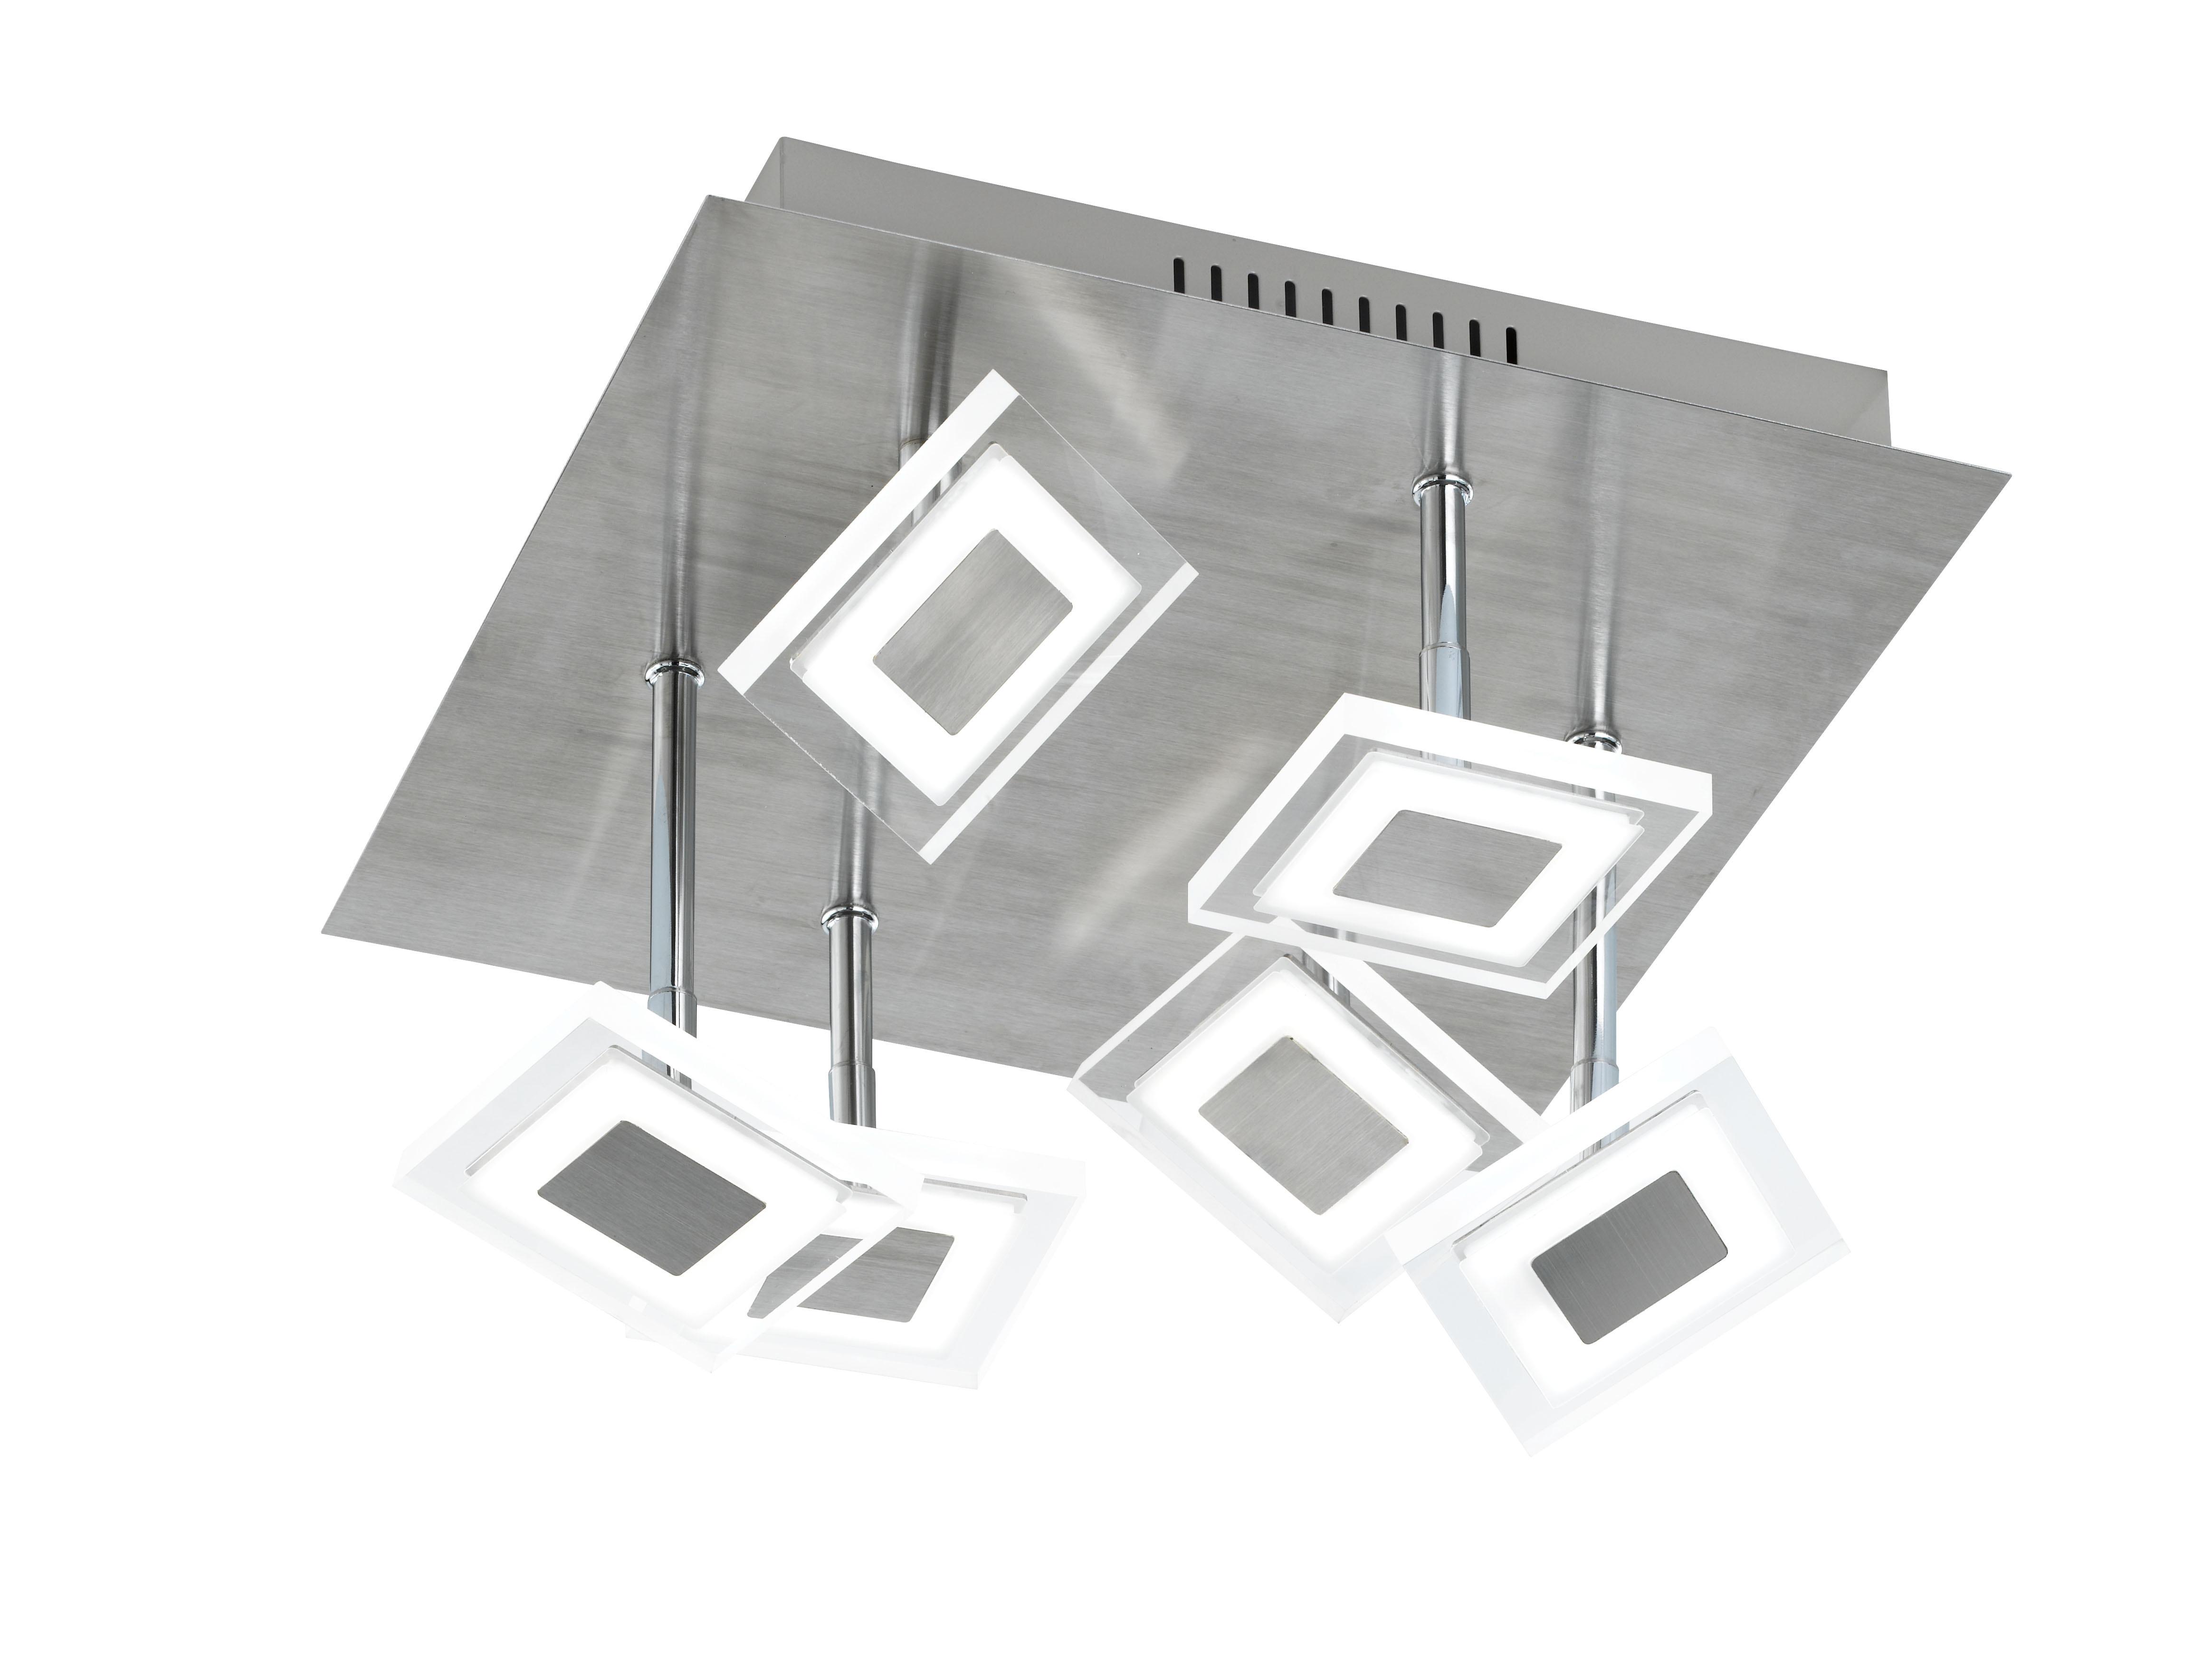 wofi deckenleuchte megan 6 flg nickel matt chrom. Black Bedroom Furniture Sets. Home Design Ideas